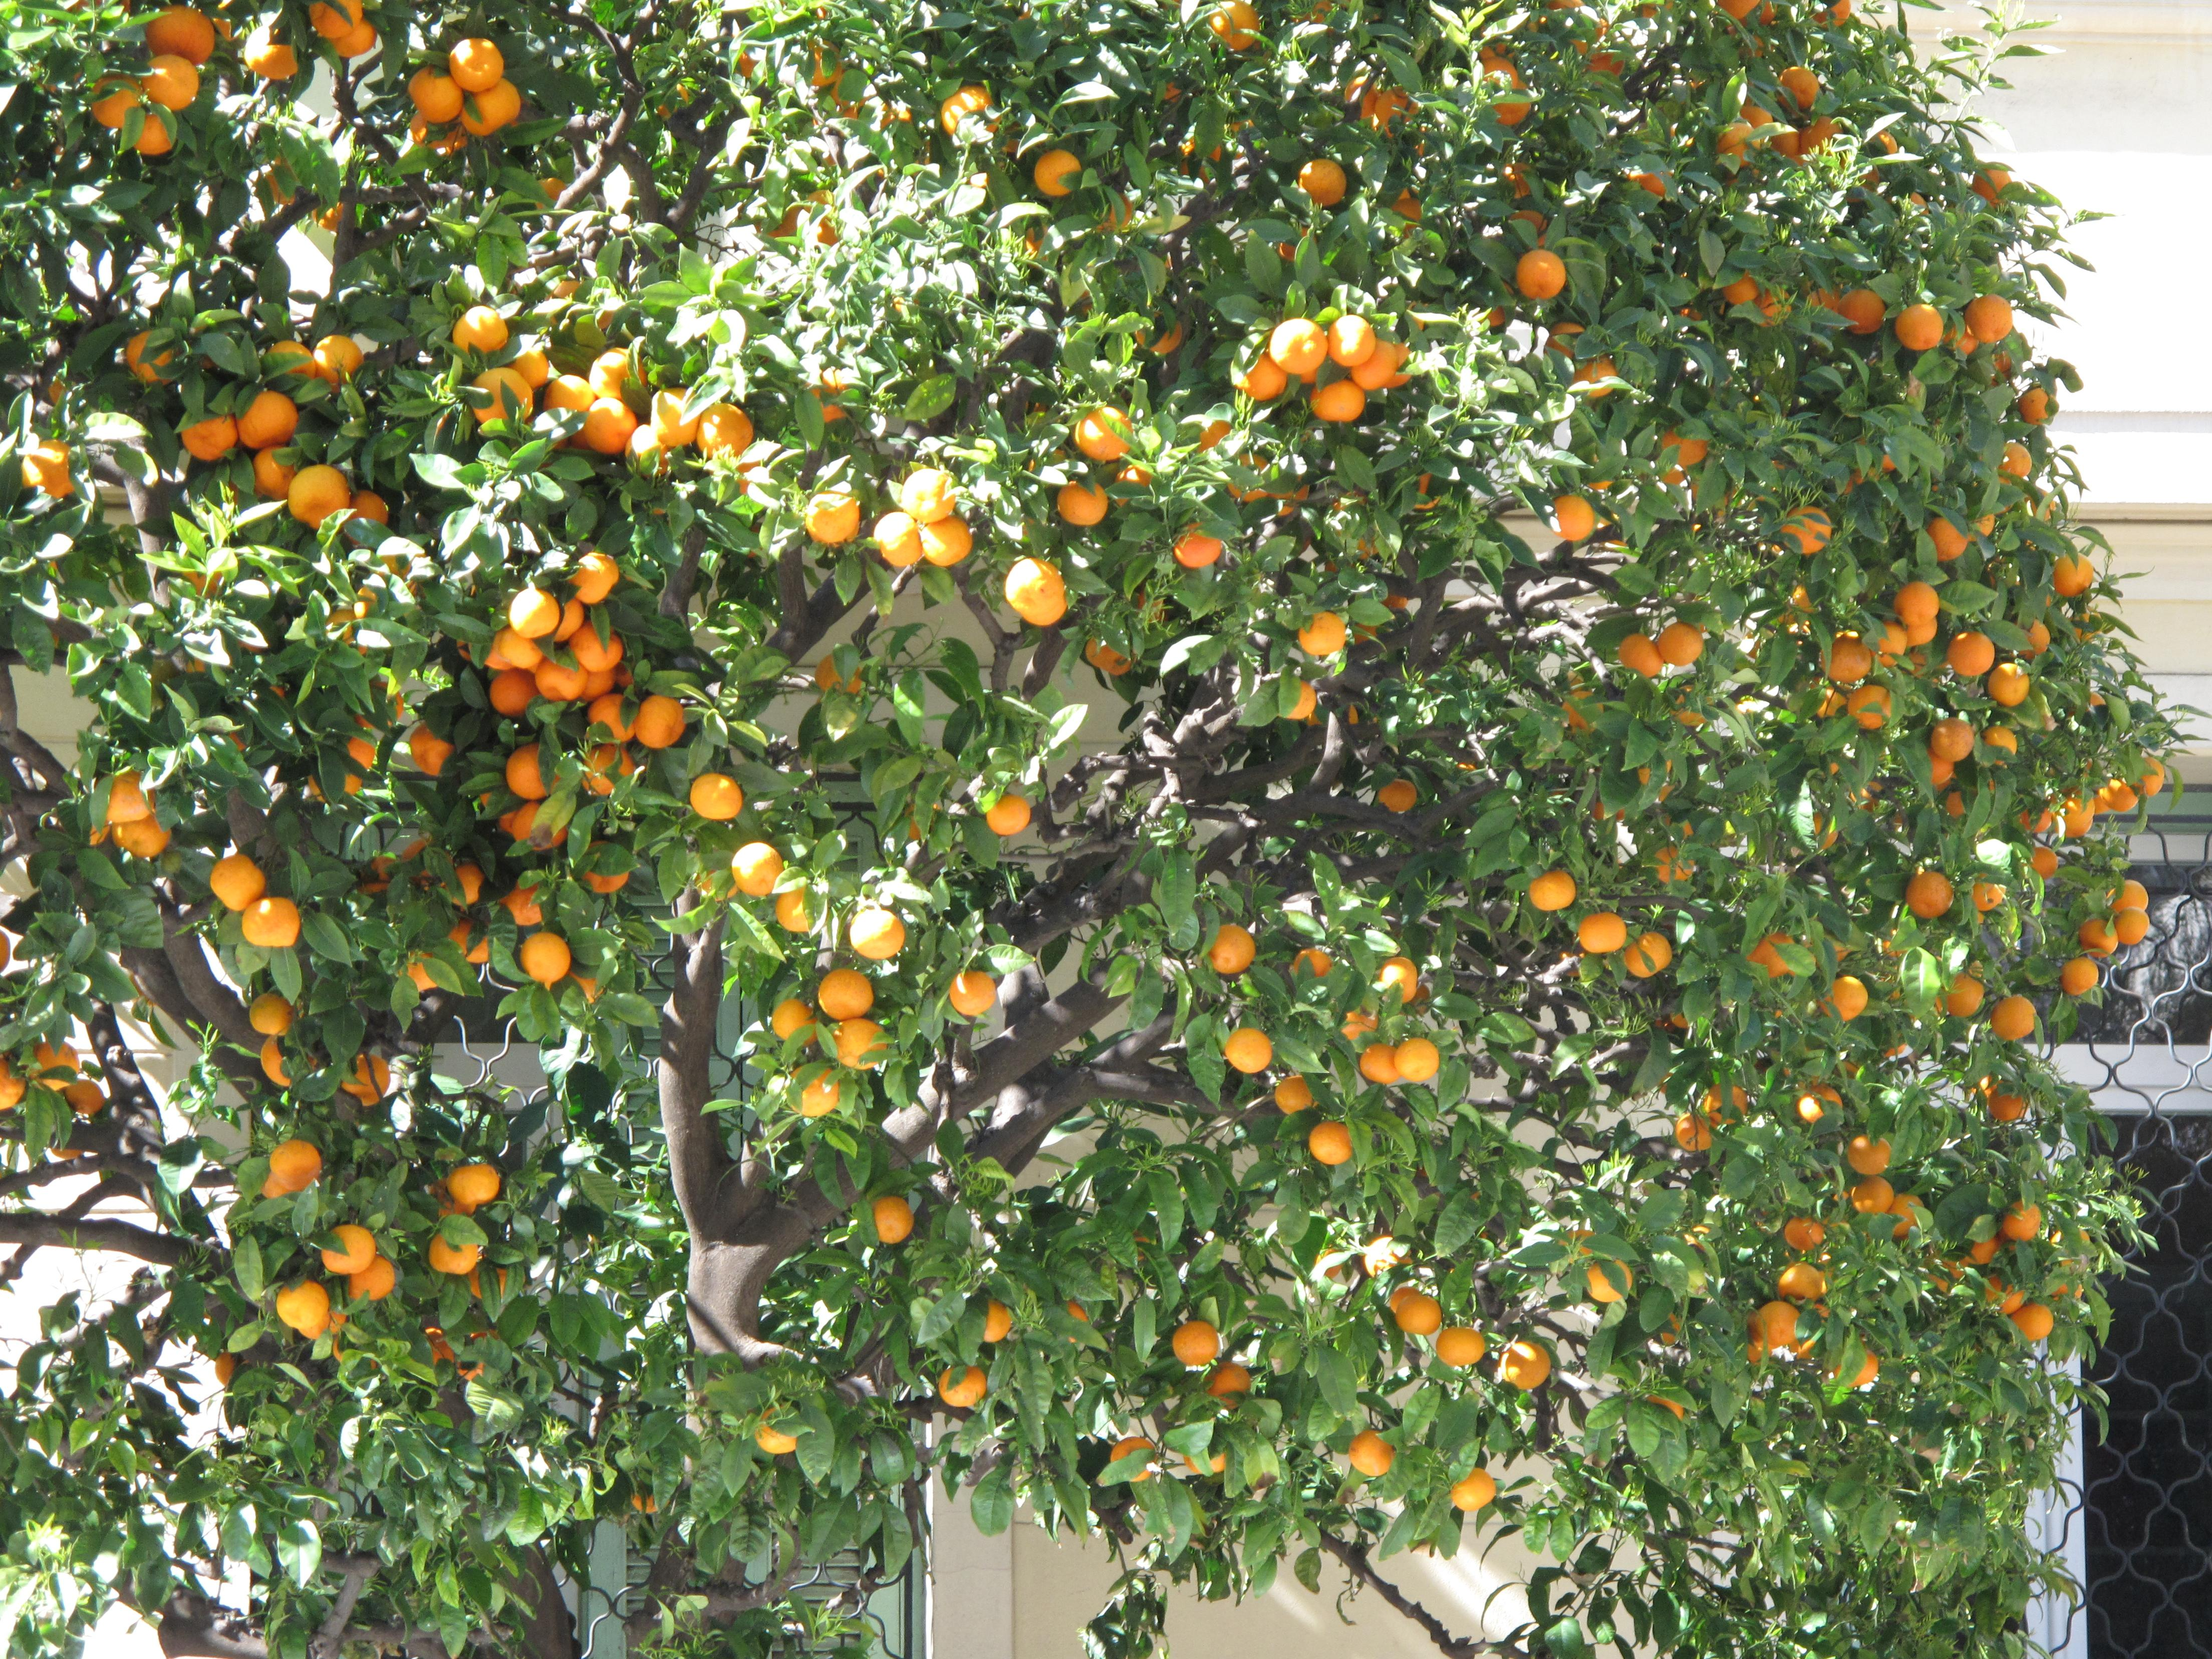 Lemon Law California >> File:Orange tree in Menton.jpg